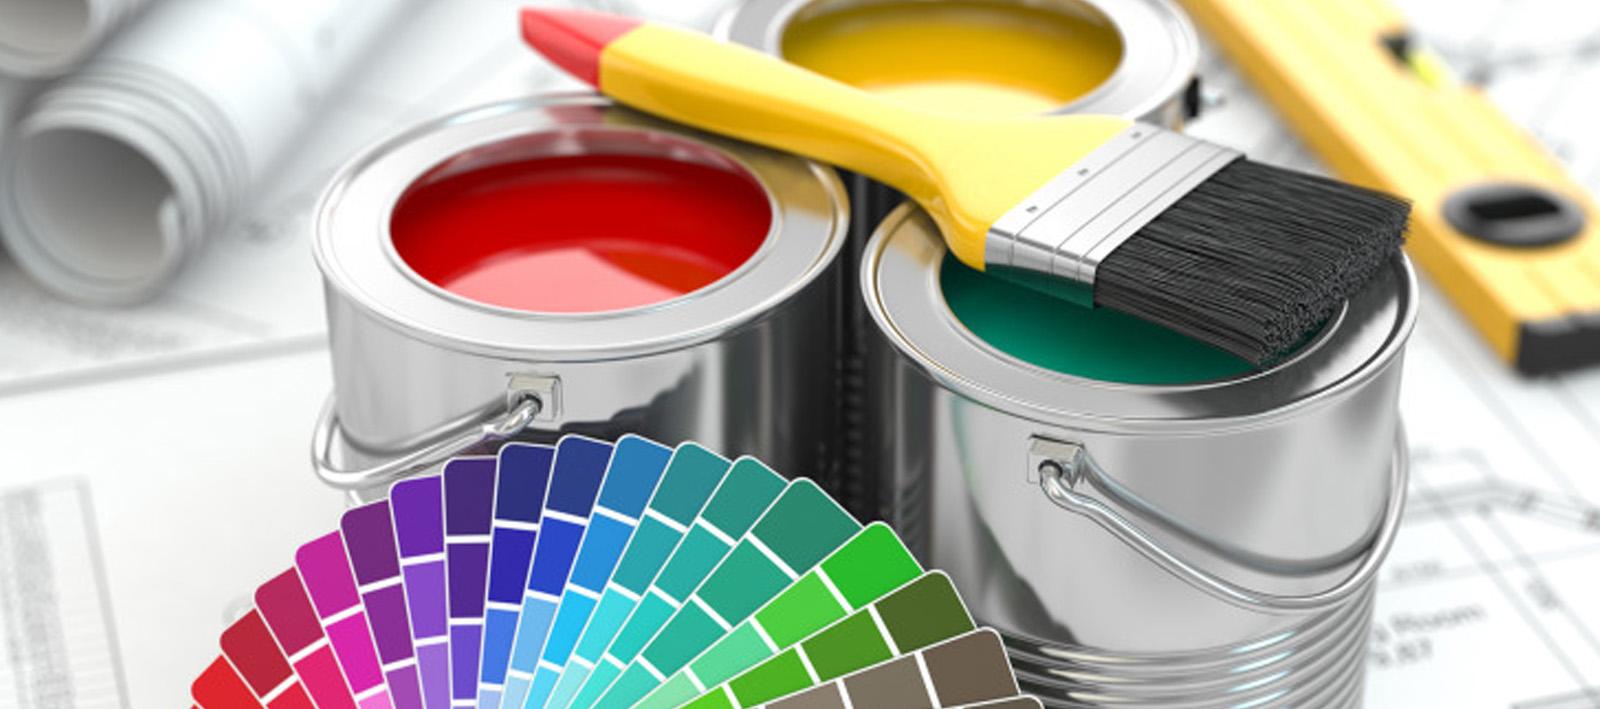 Best Decorating Pictures Ideas - Liltigertoo.com - liltigertoo.com